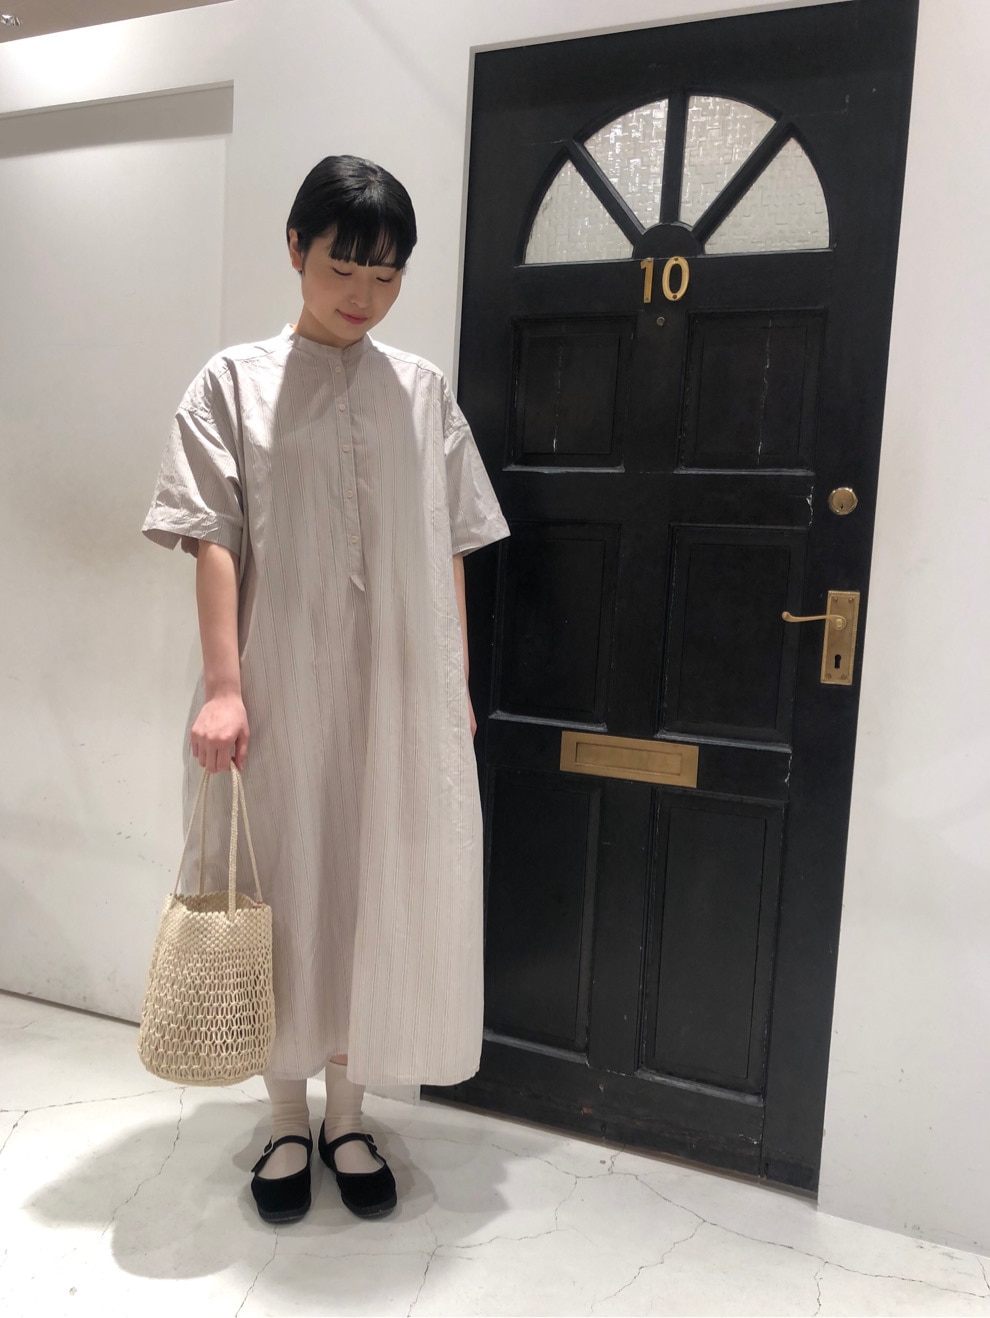 Dot and Stripes CHILD WOMAN ルクアイーレ 身長:165cm 2020.06.11